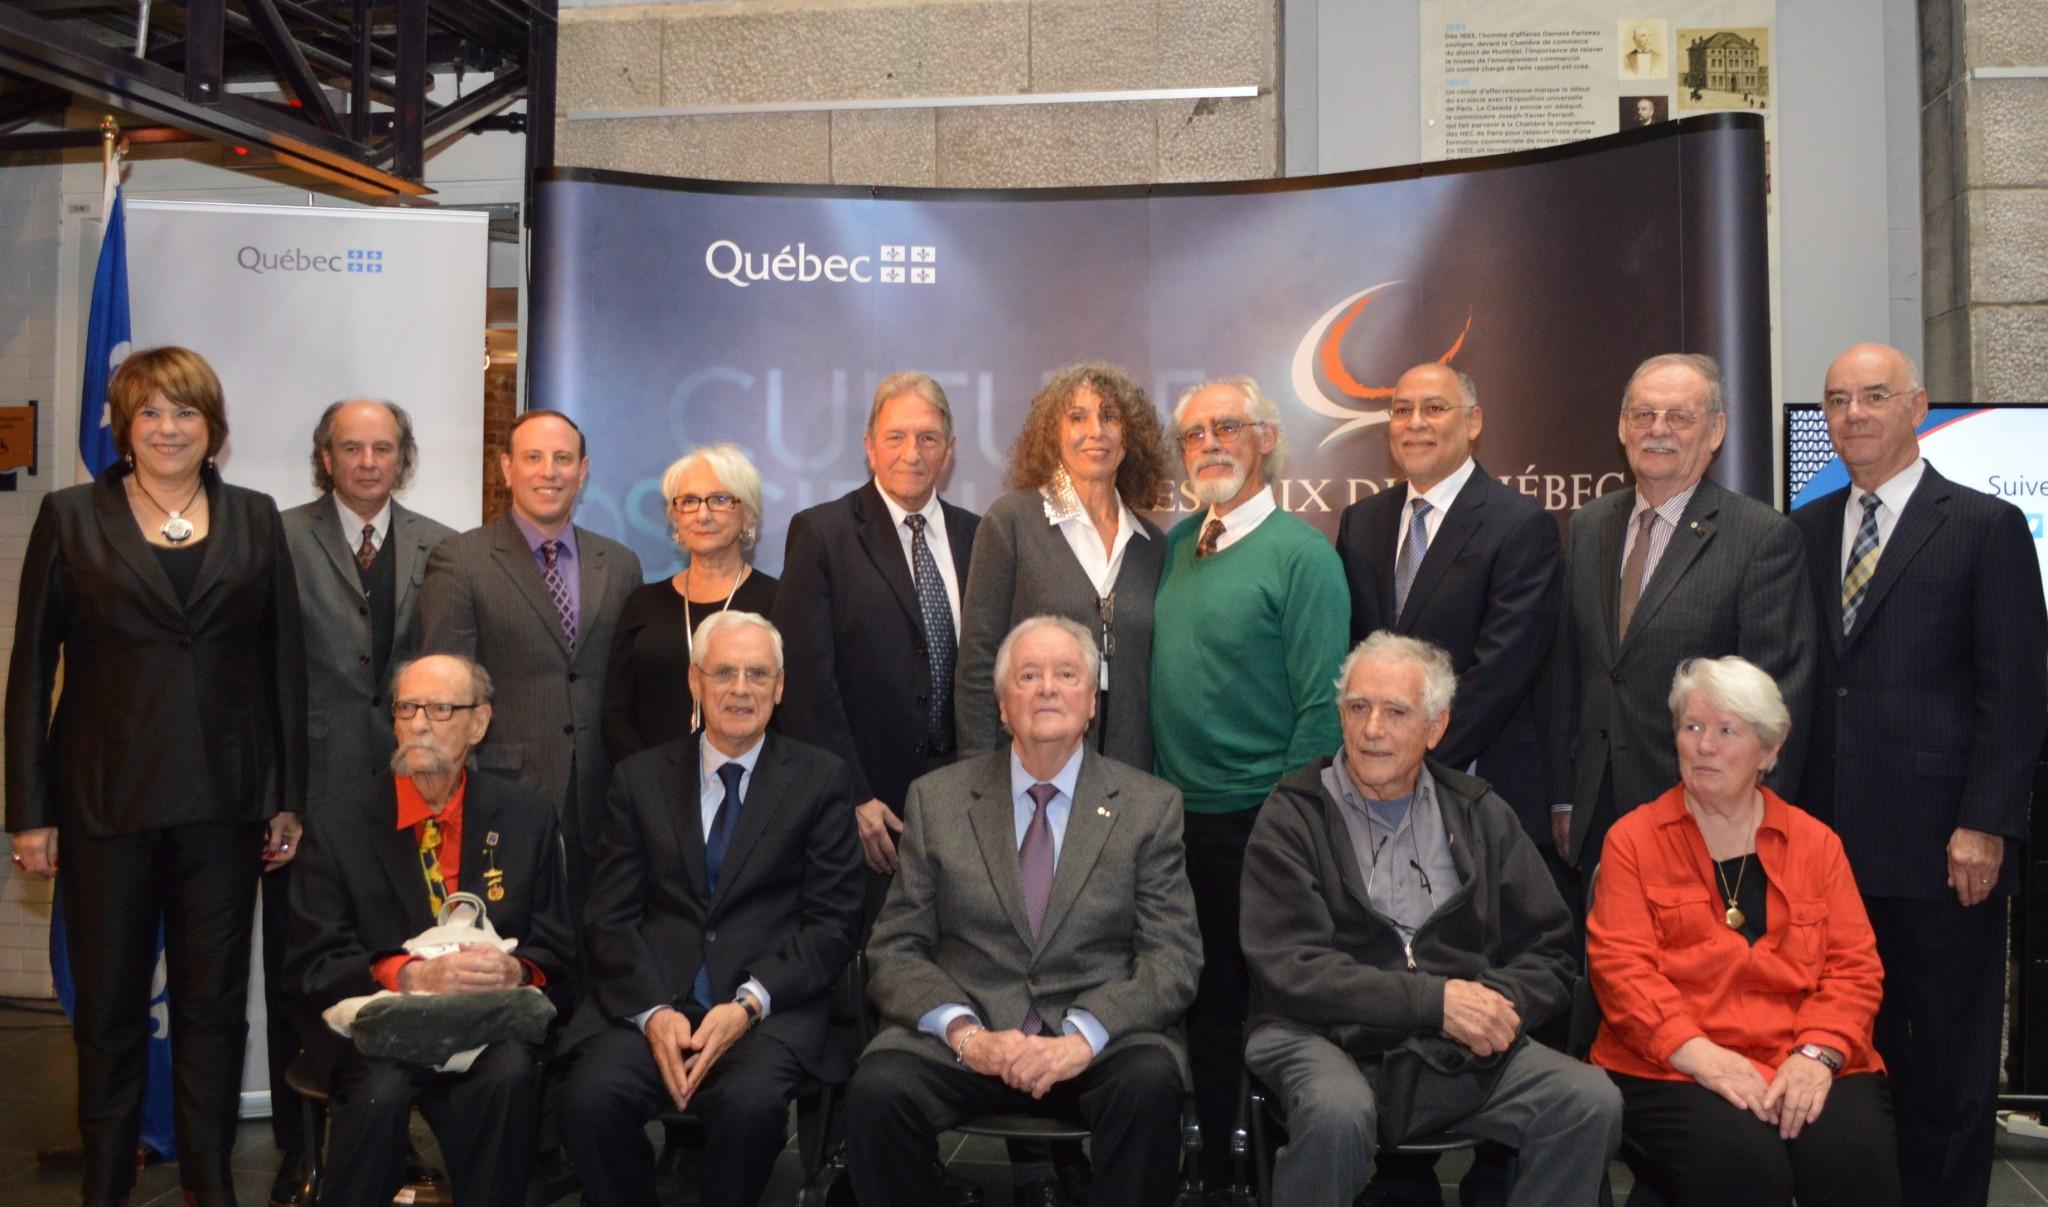 Jean Bissonnette et Martin Duckworth - Prix du Québec